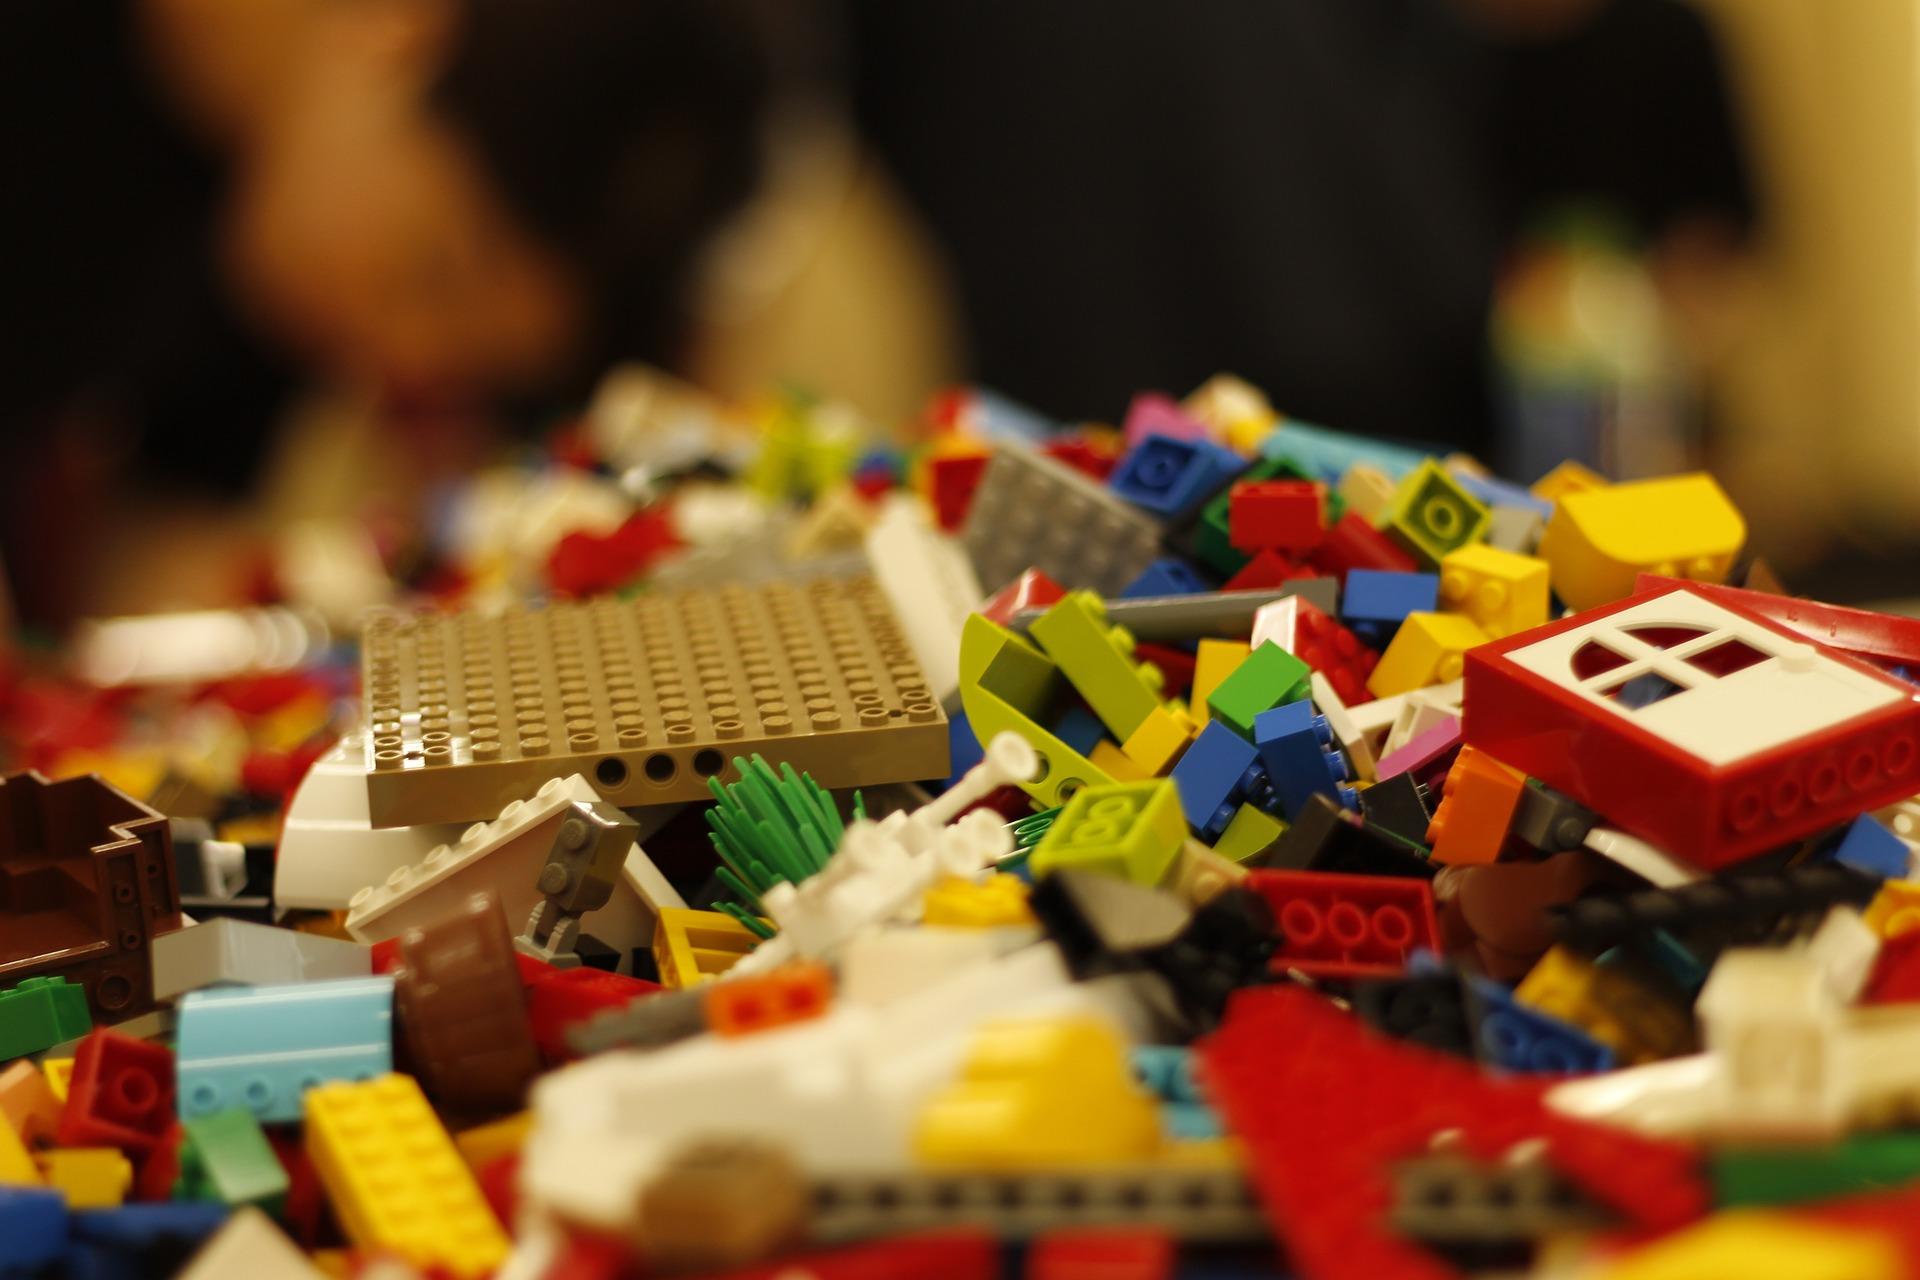 A jumbled pile of Lego